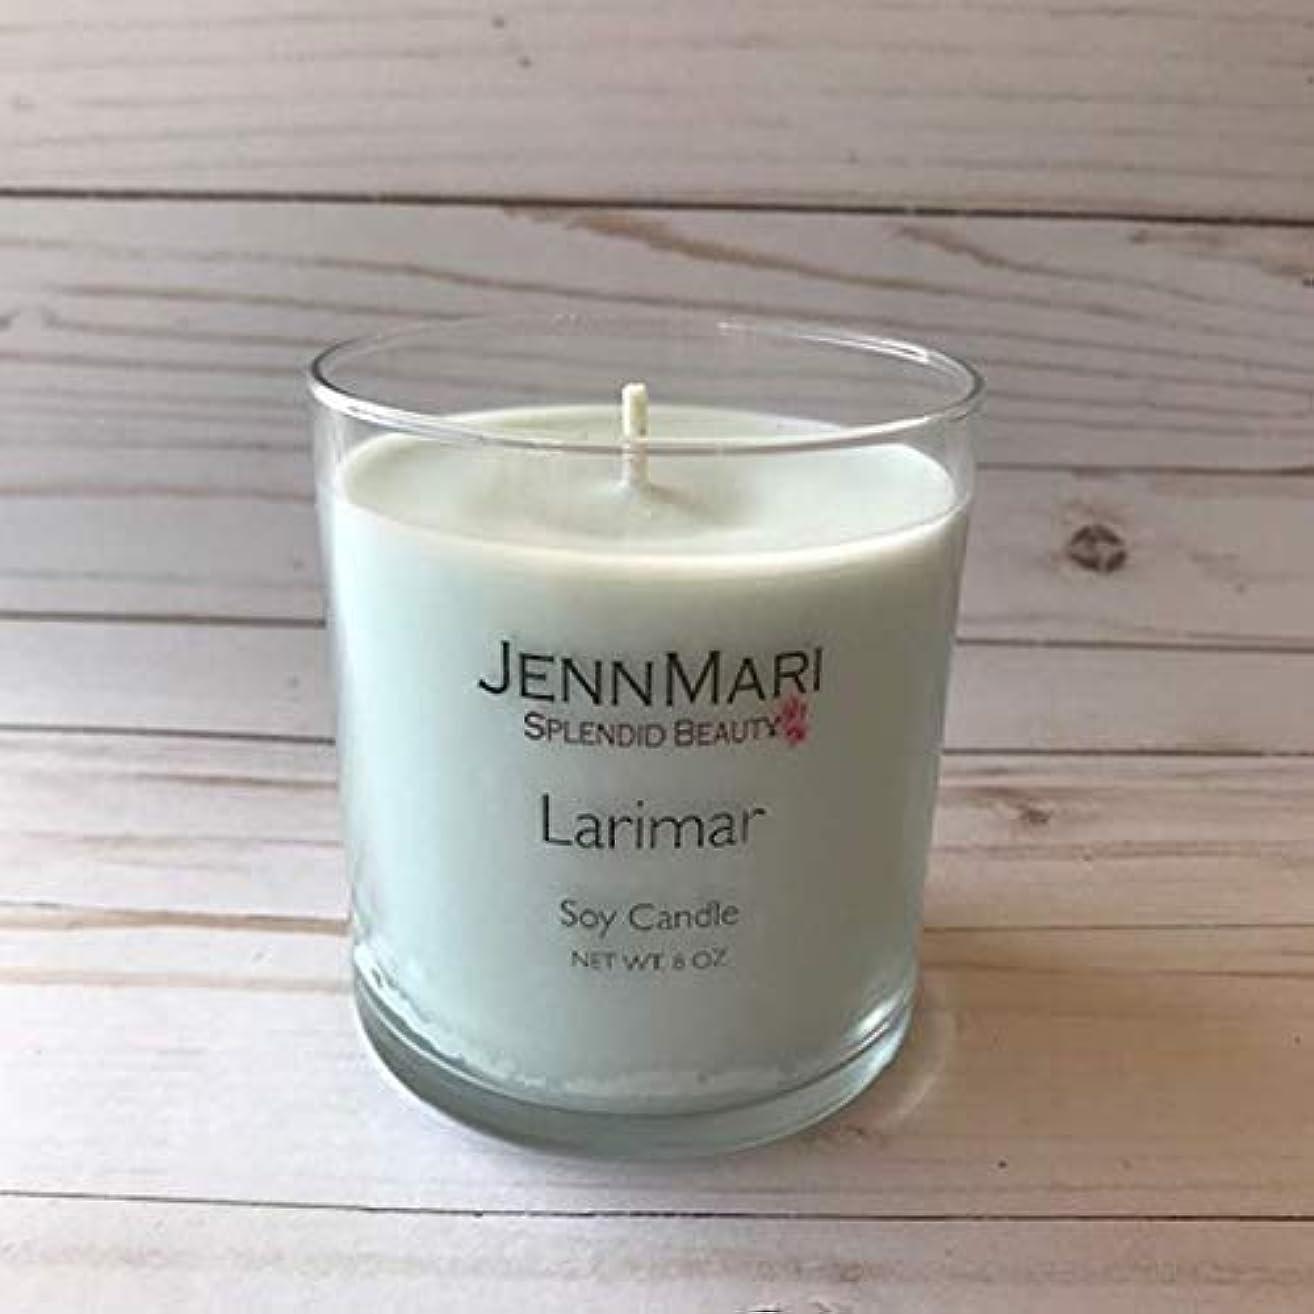 Splendid Beauty   Larimar Scented Soy Candle Glass Jar   10 Oz   Handmade   Eco-friendly   Vegan   Cotton Wick   100% Soy Wax